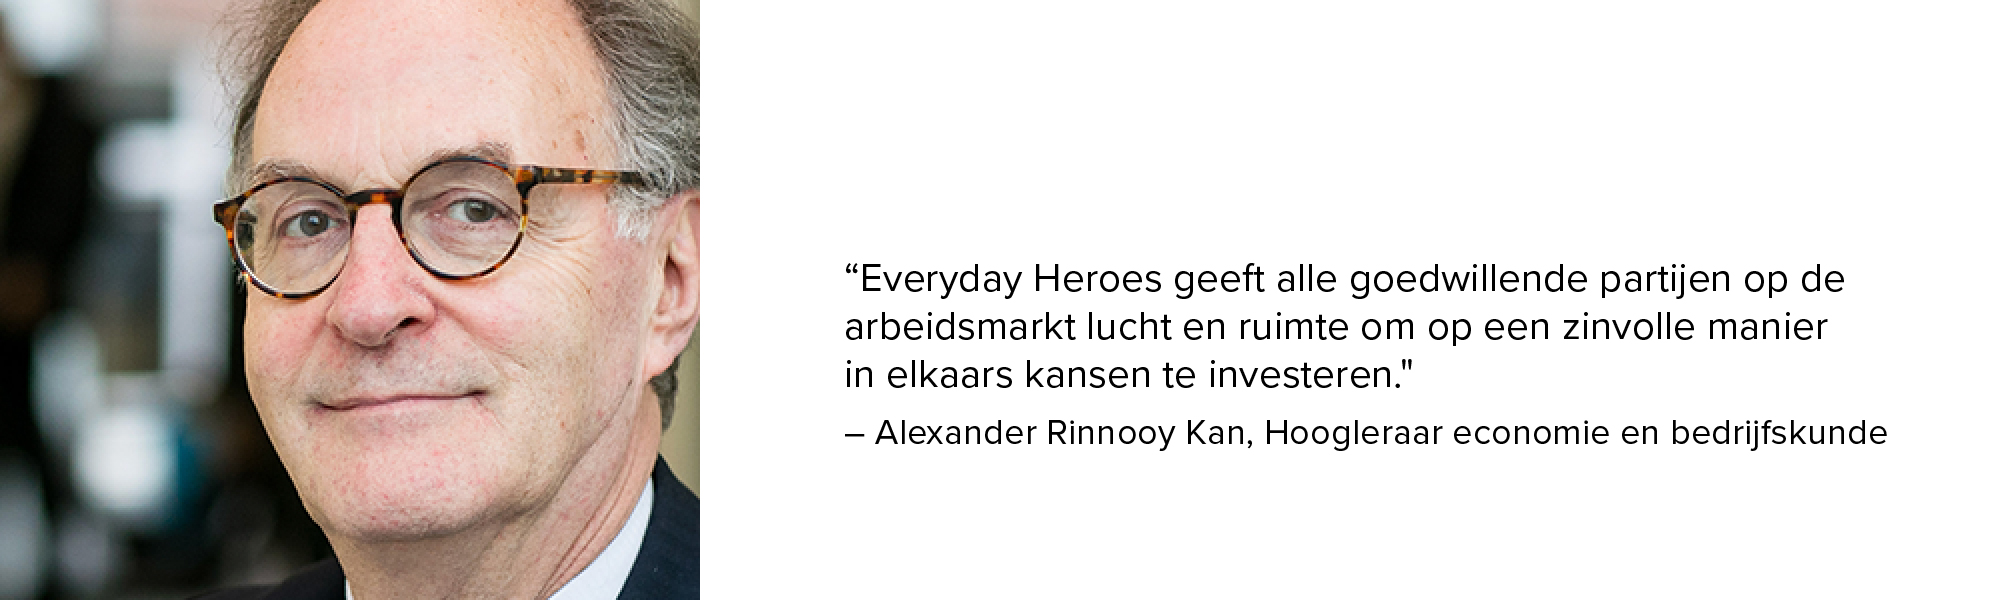 Alexander Rinnooy Kan@2x-100.jpg